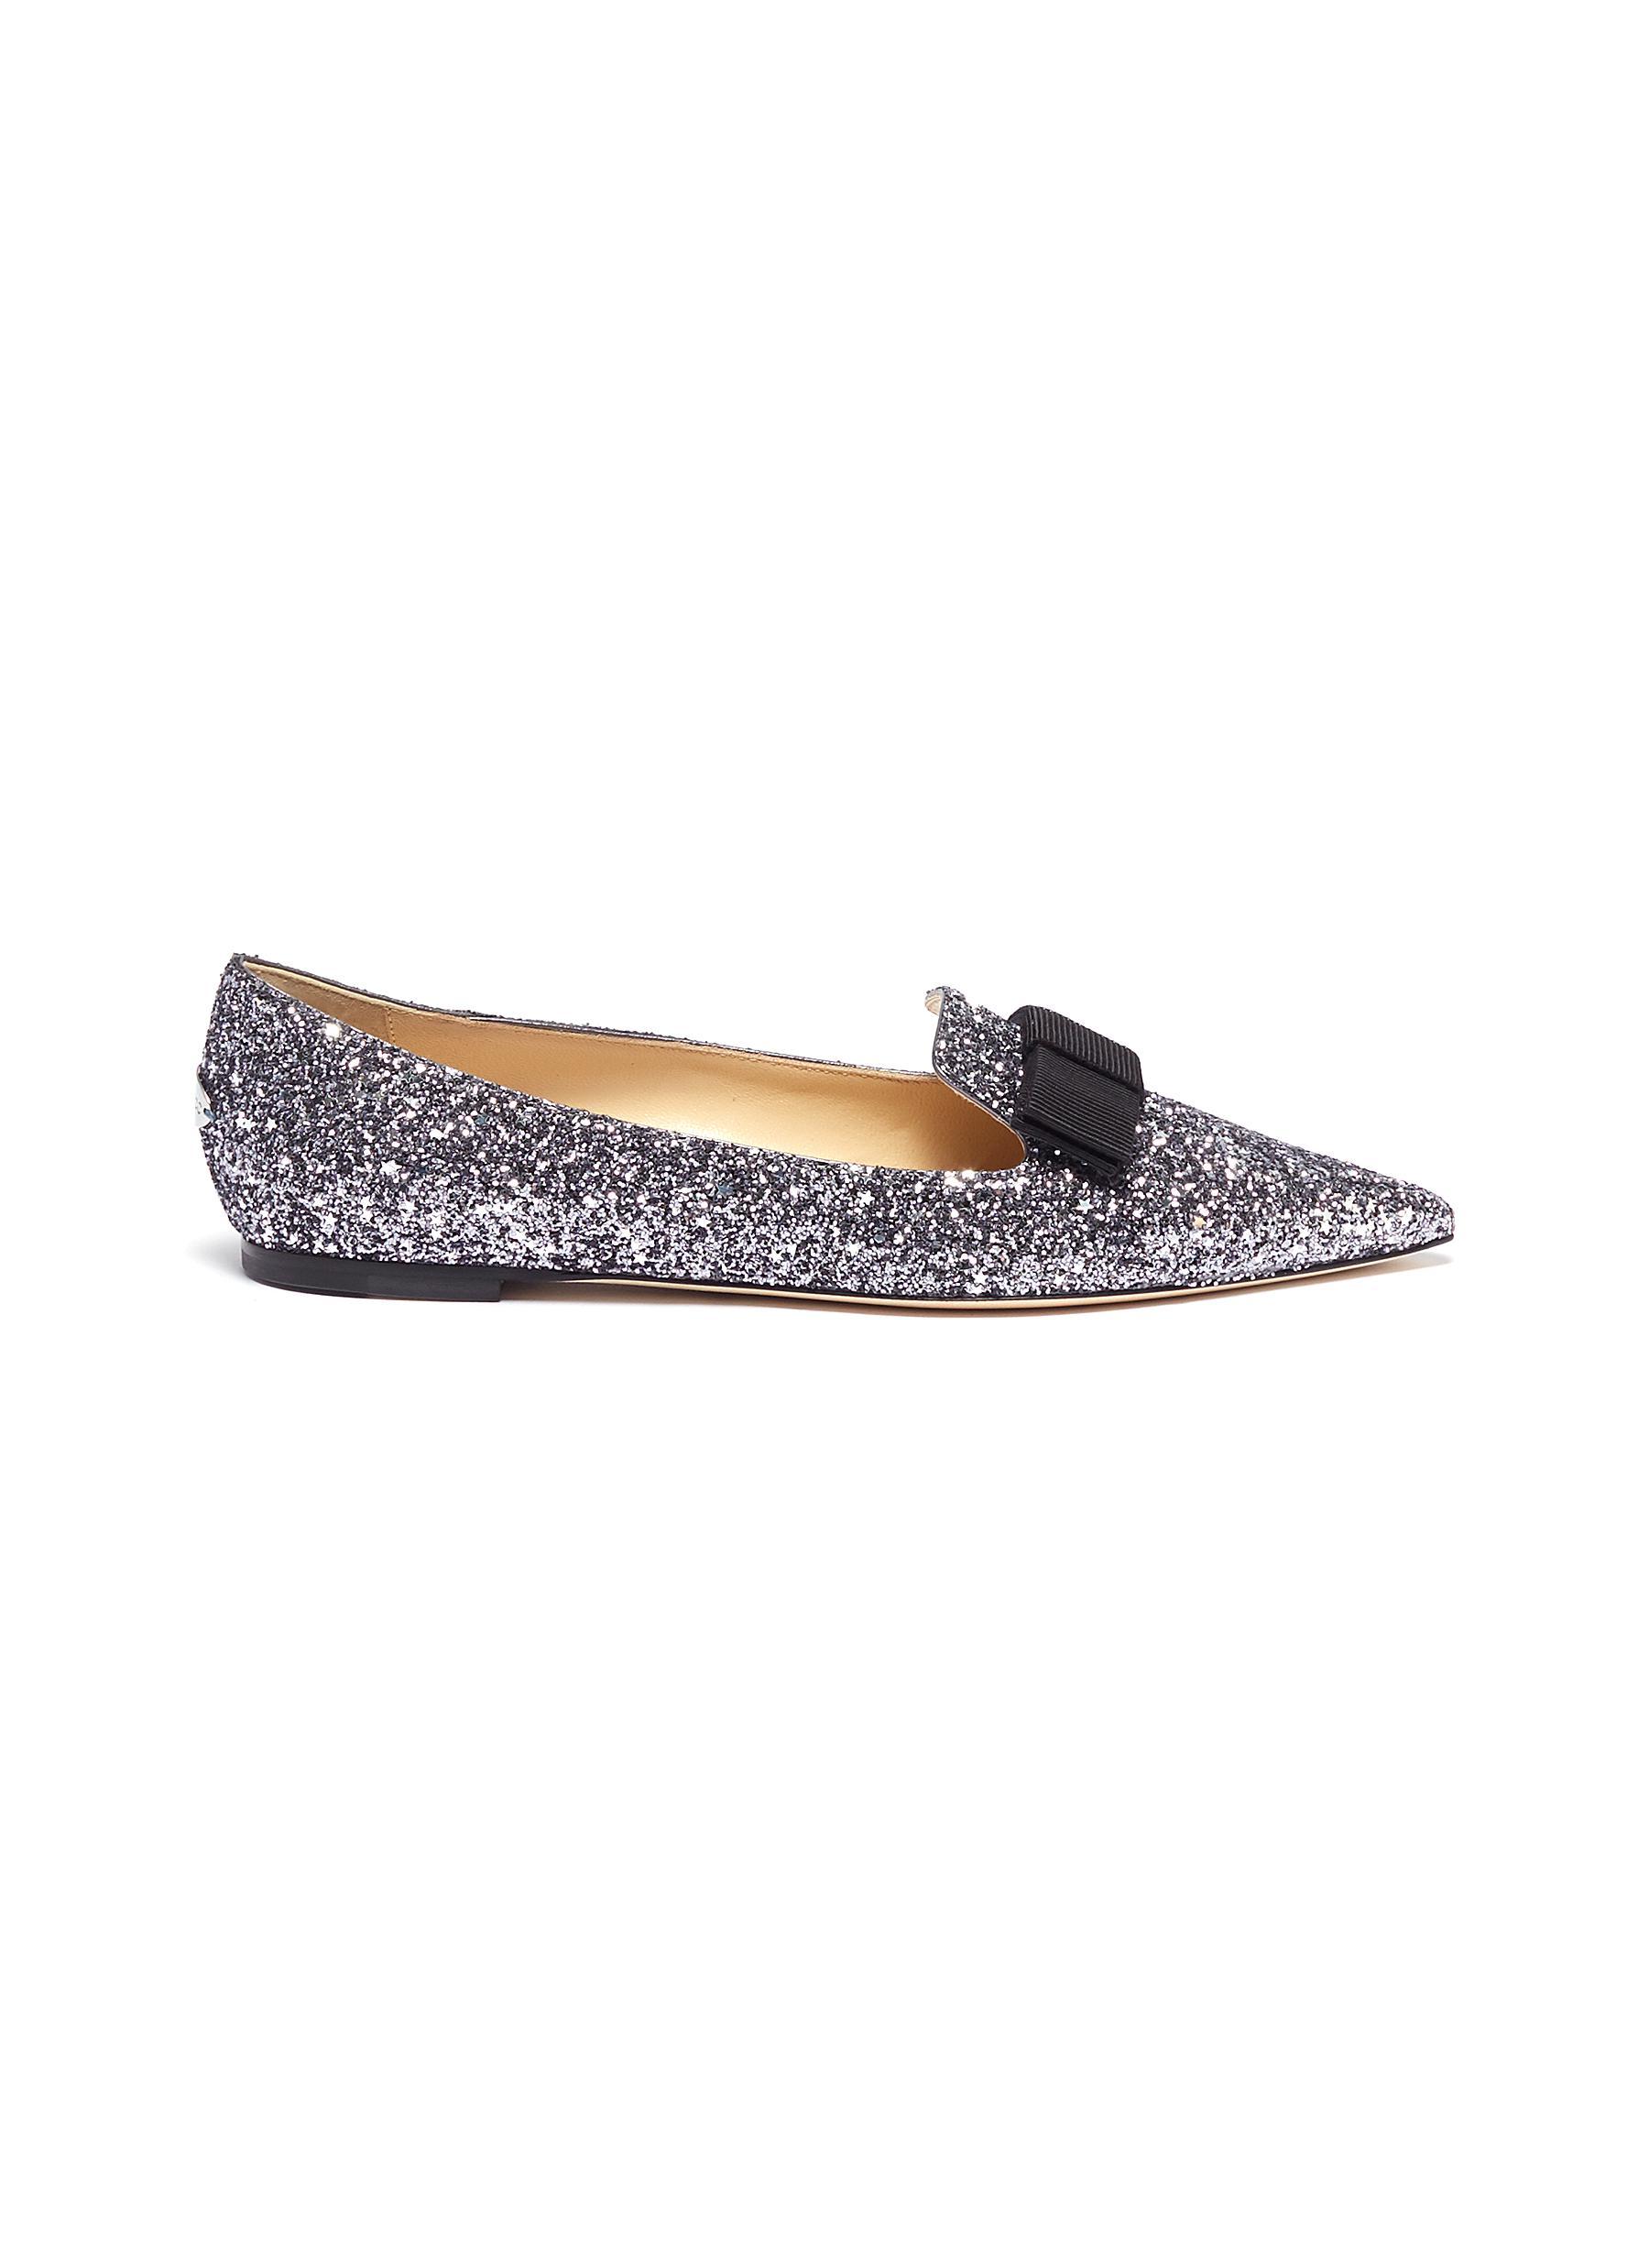 Gala bow coarse glitter loafers by Jimmy Choo